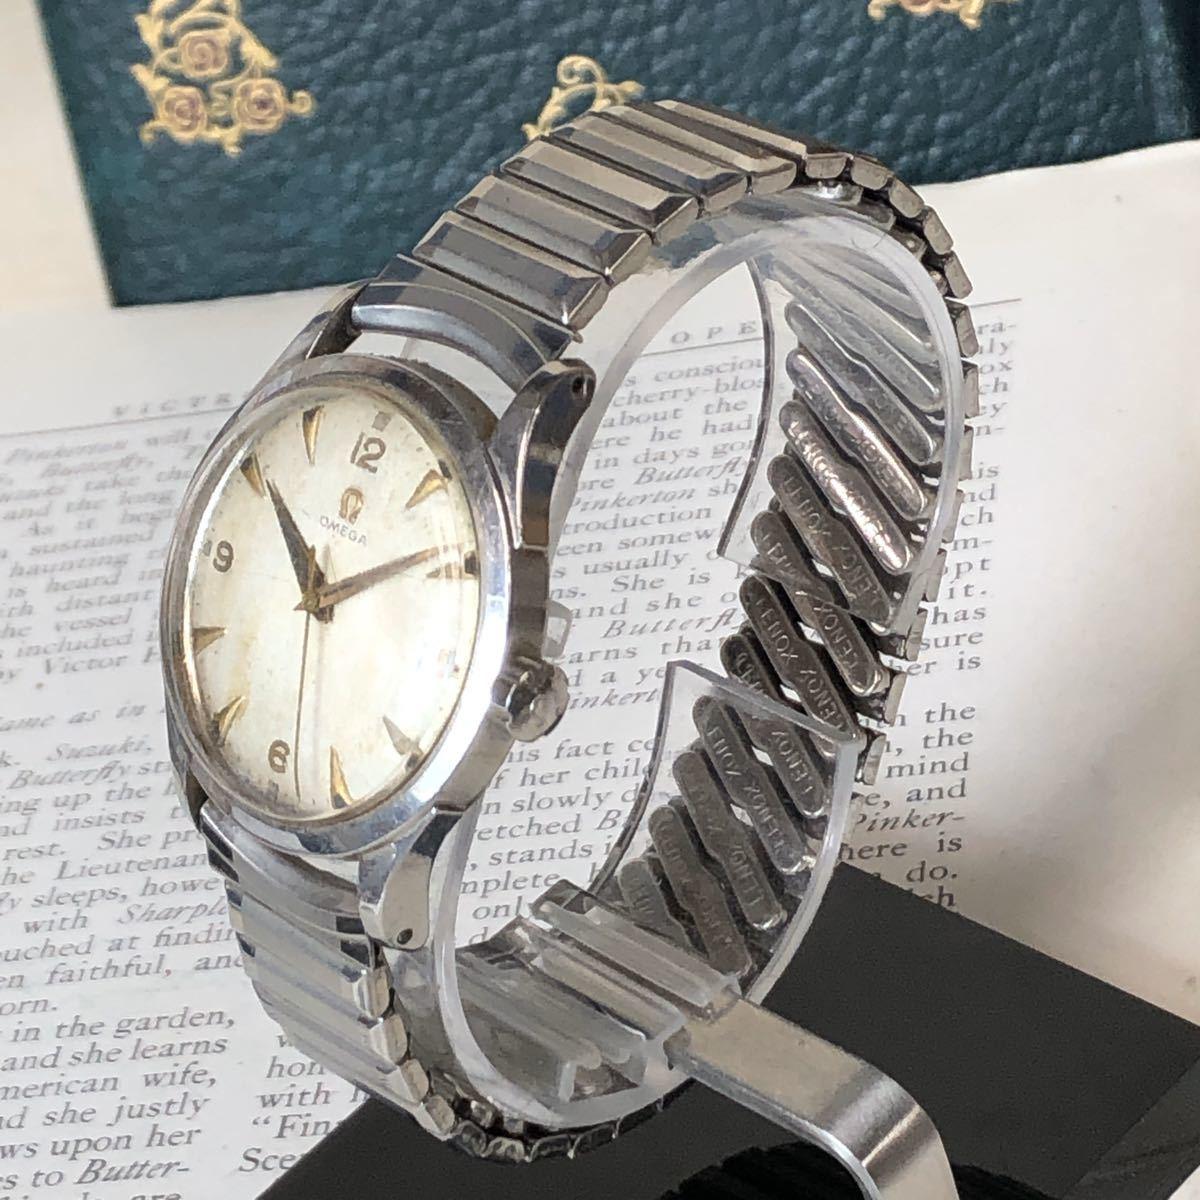 OMEGA オメガ 腕時計 機械式 自動巻 ハーフロータリー SWISS MADE スイス SS 3針 ビンテージ 希少 値下げ交渉あり 稼動品 W1519_画像2